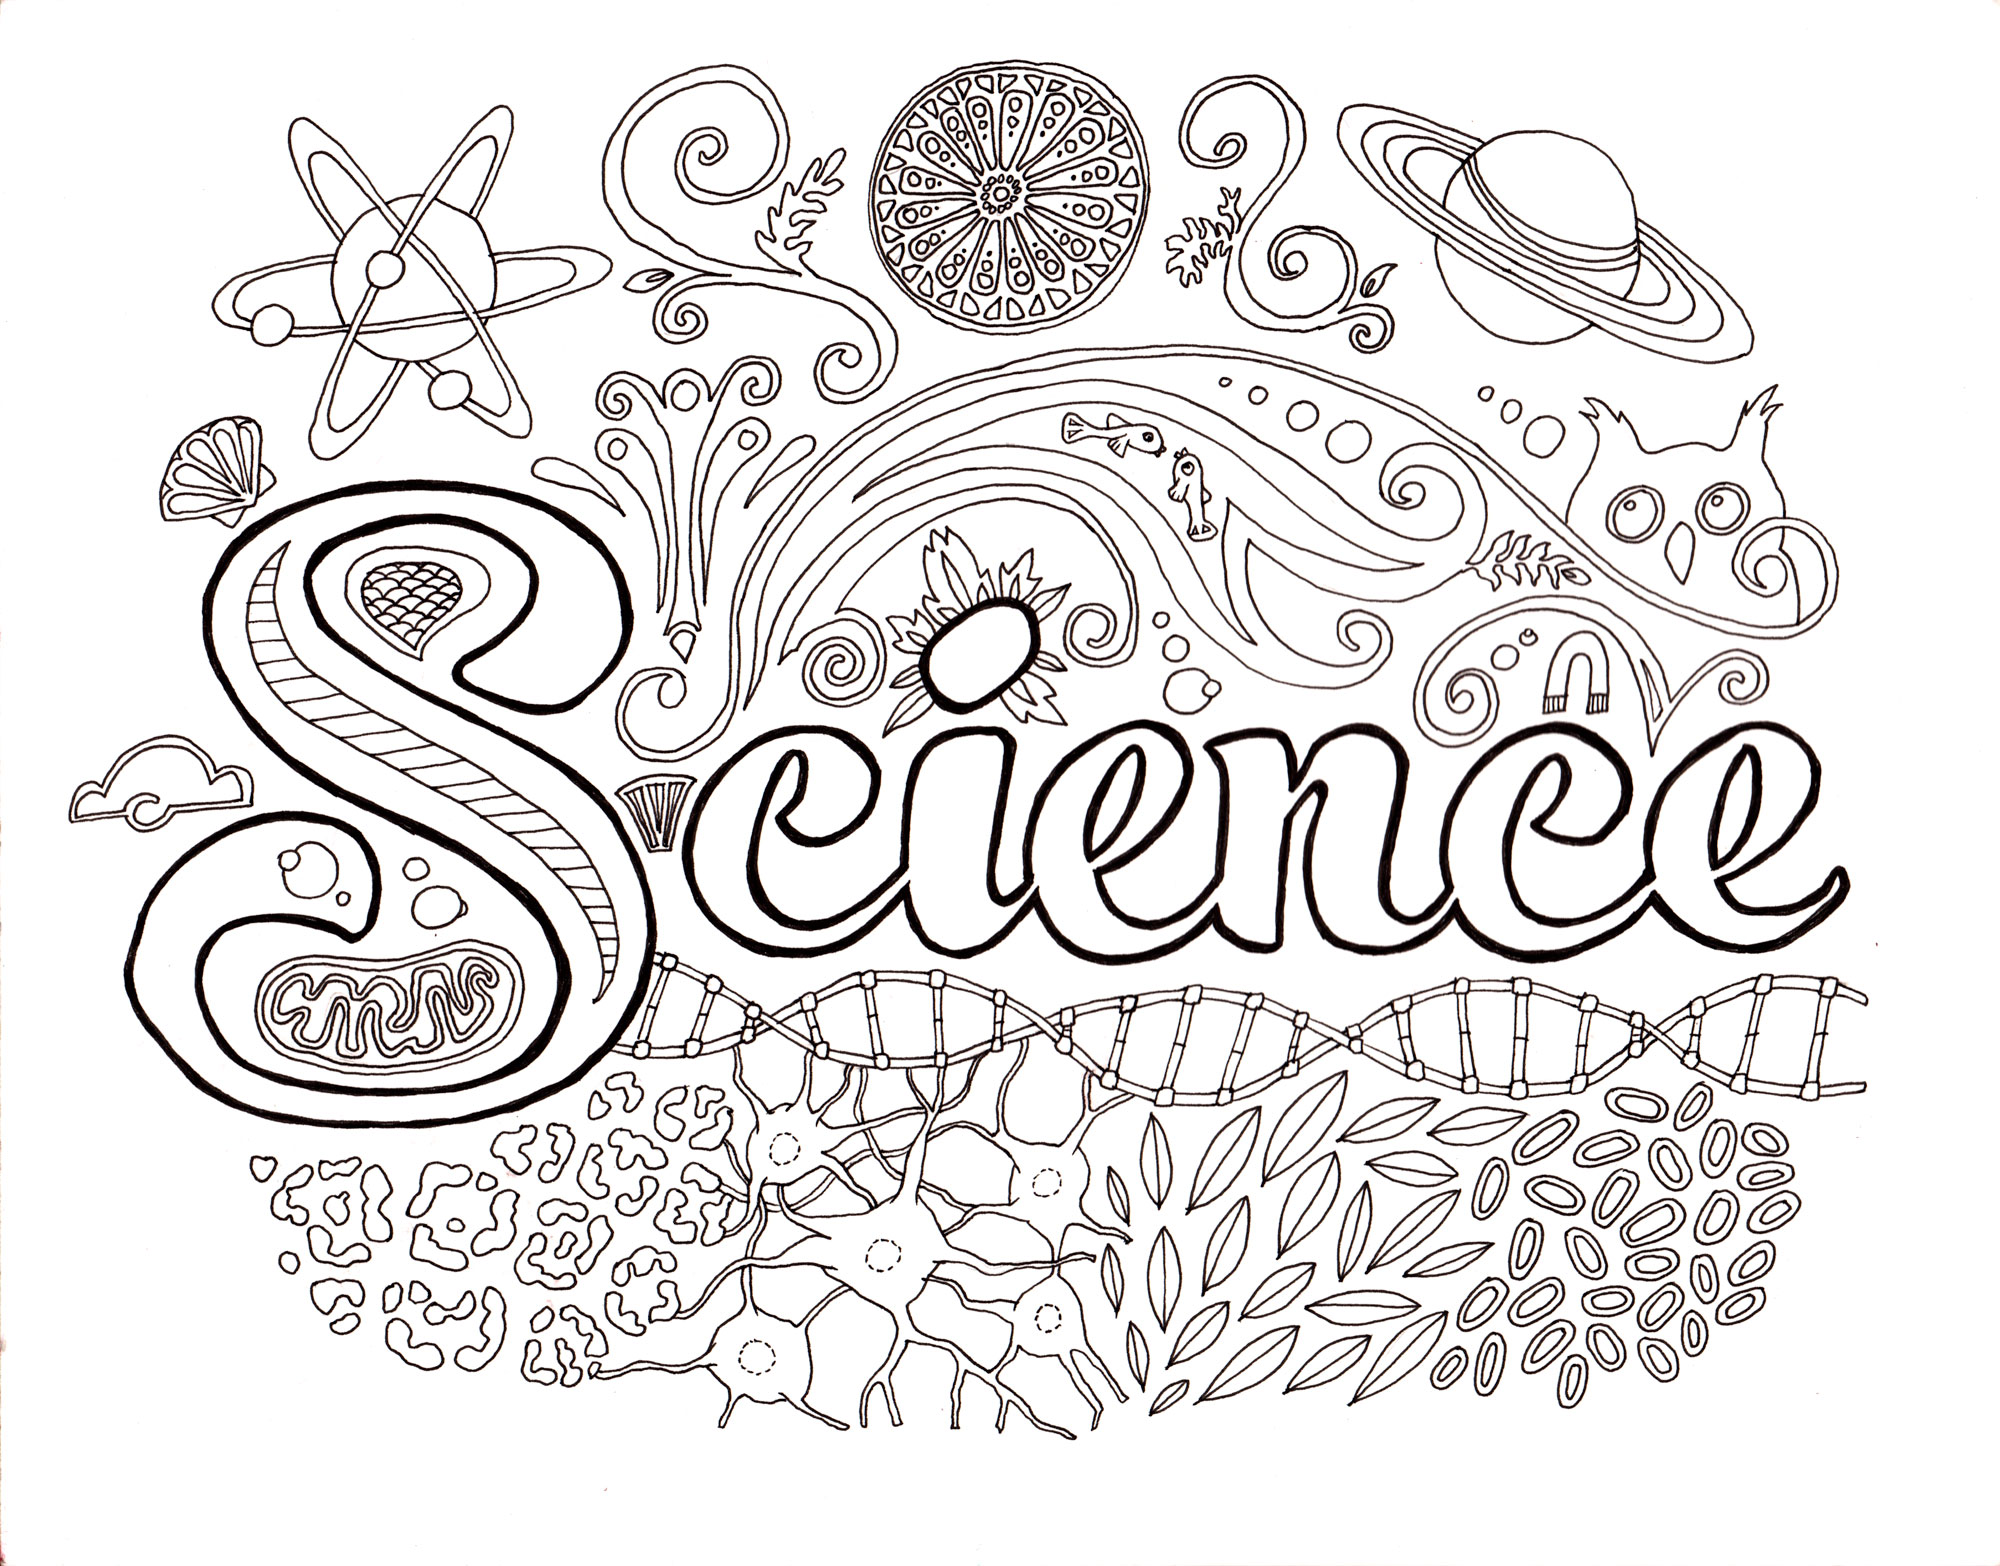 Drawn brain coloring page #5